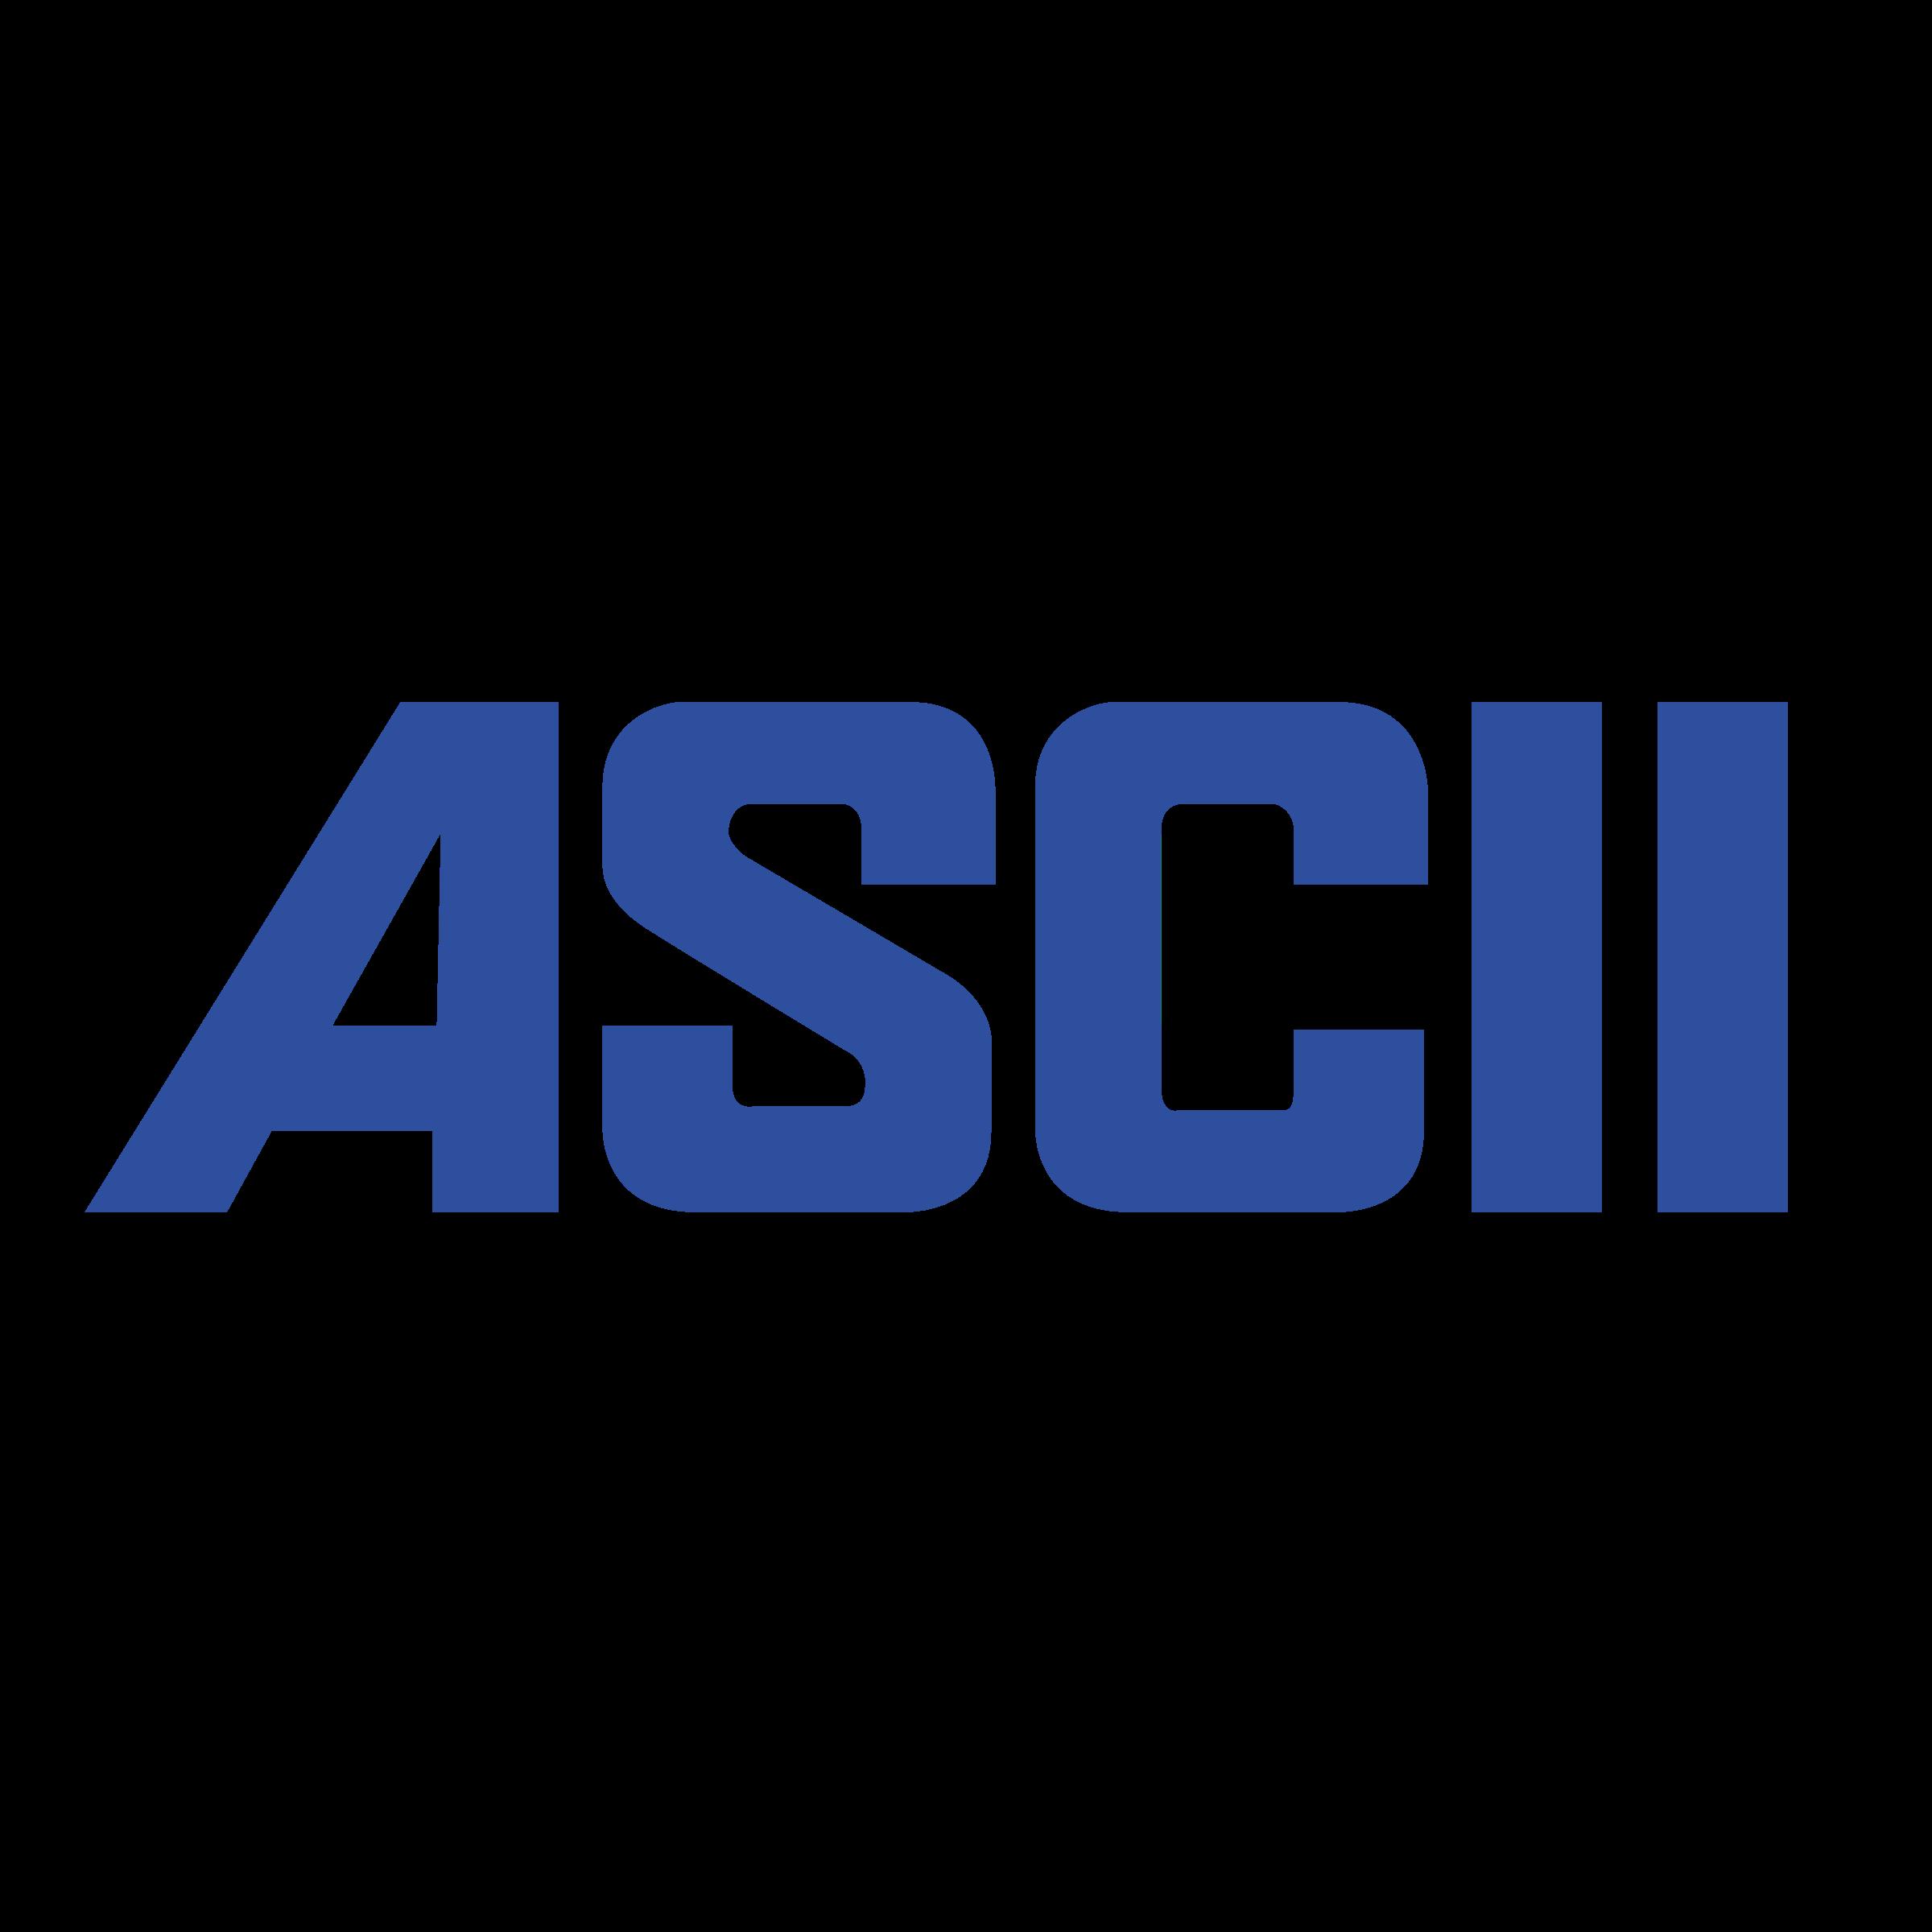 Ascii Logo Png Transparent Svg Vector Freebie Supply